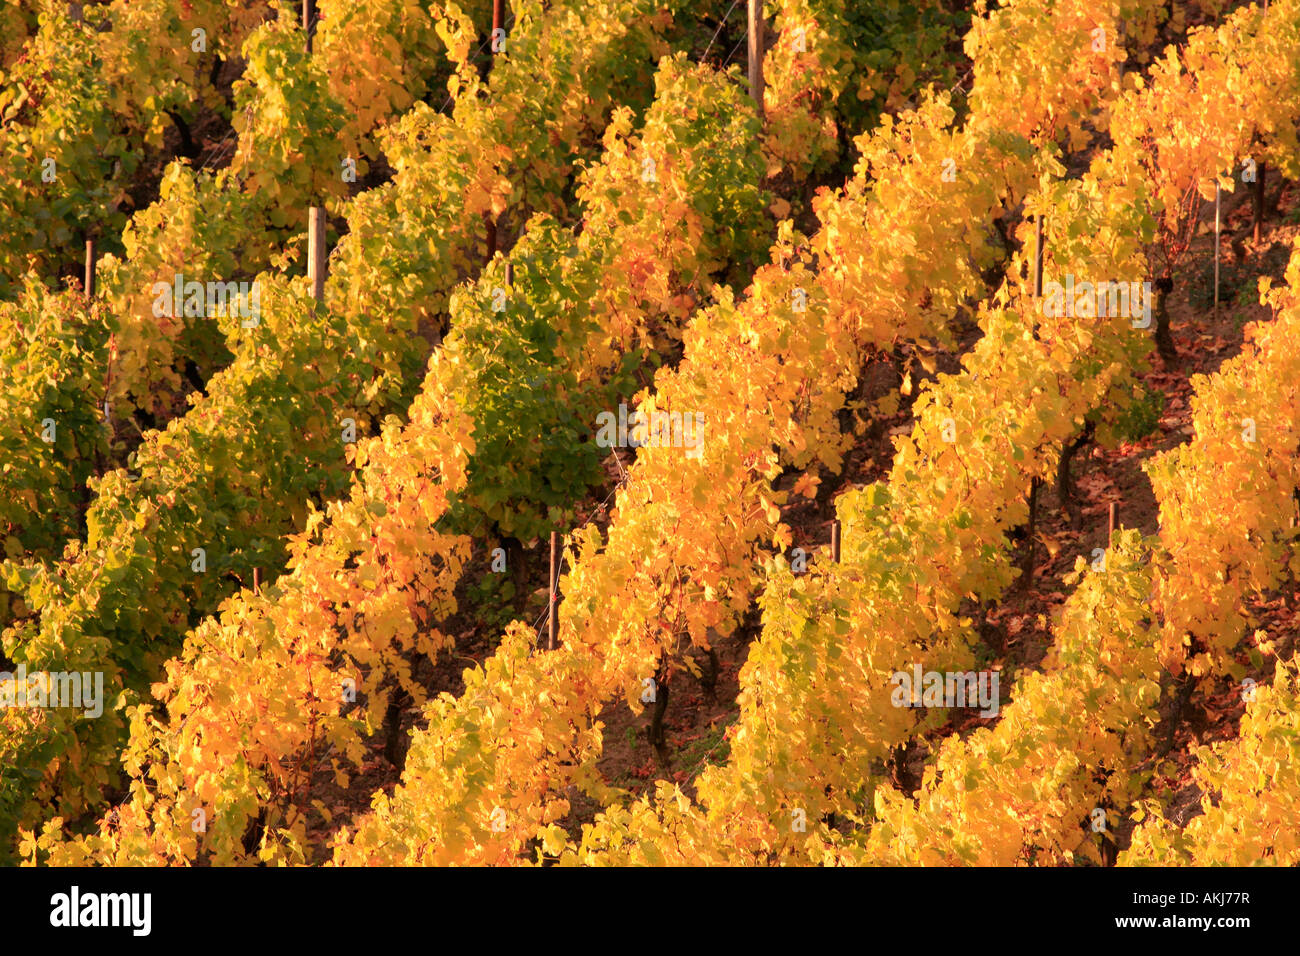 golden vineyard in autumn Höhnstedt Germany Stock Photo